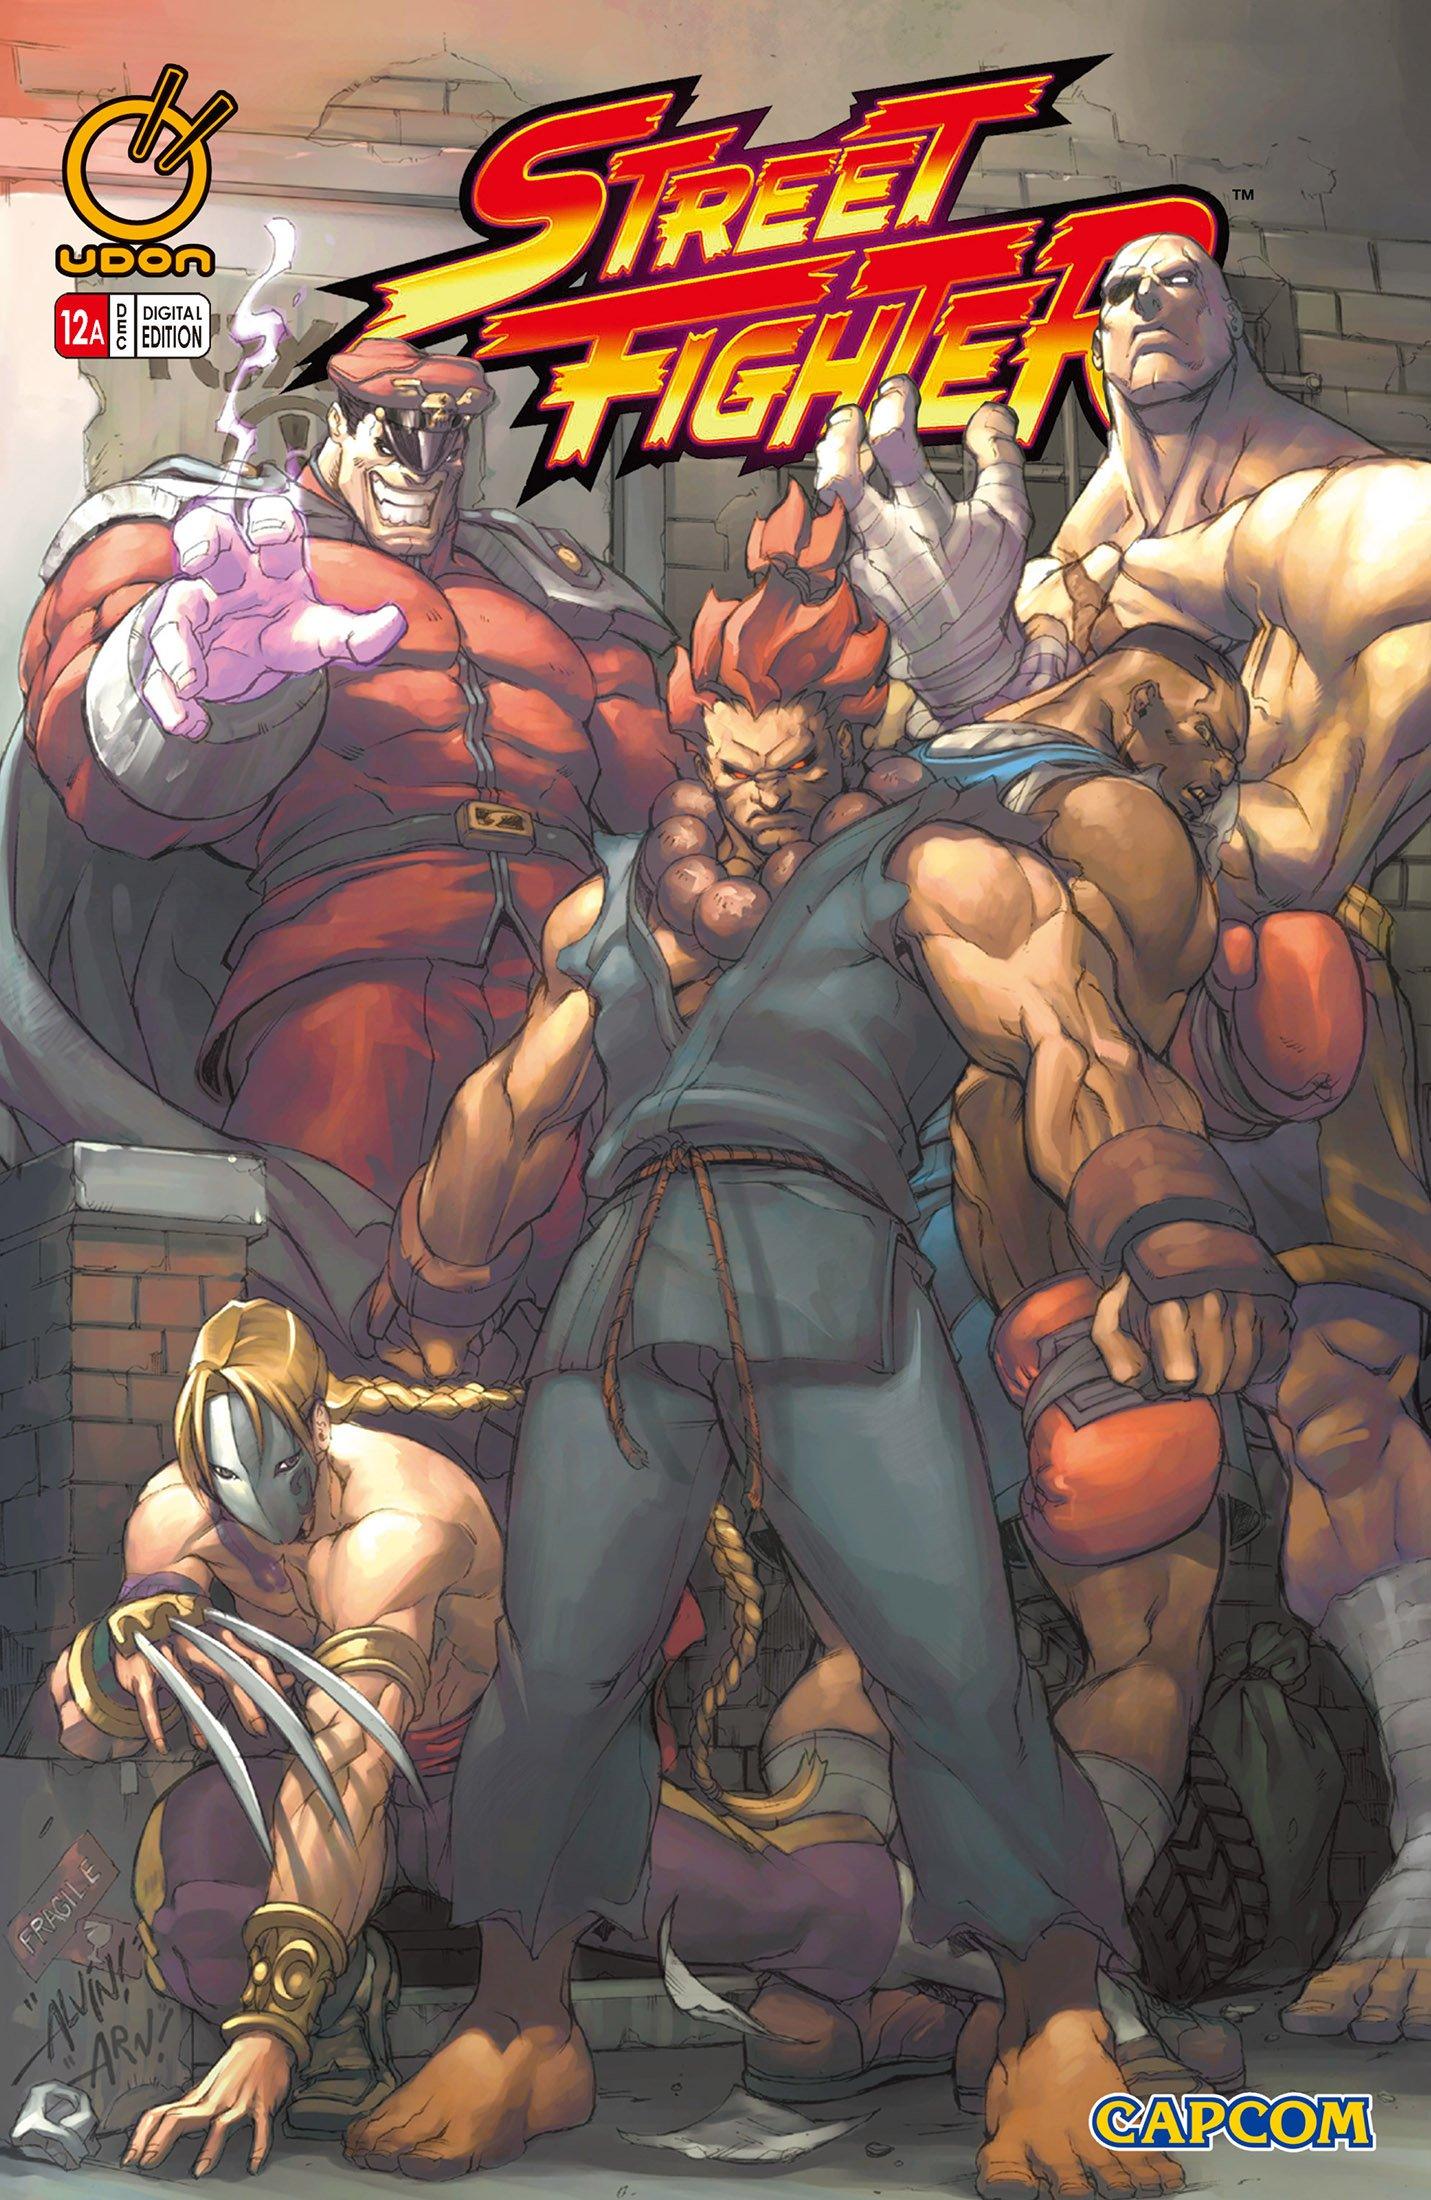 Street Fighter Vol.1 012 (December 2004) (cover a)